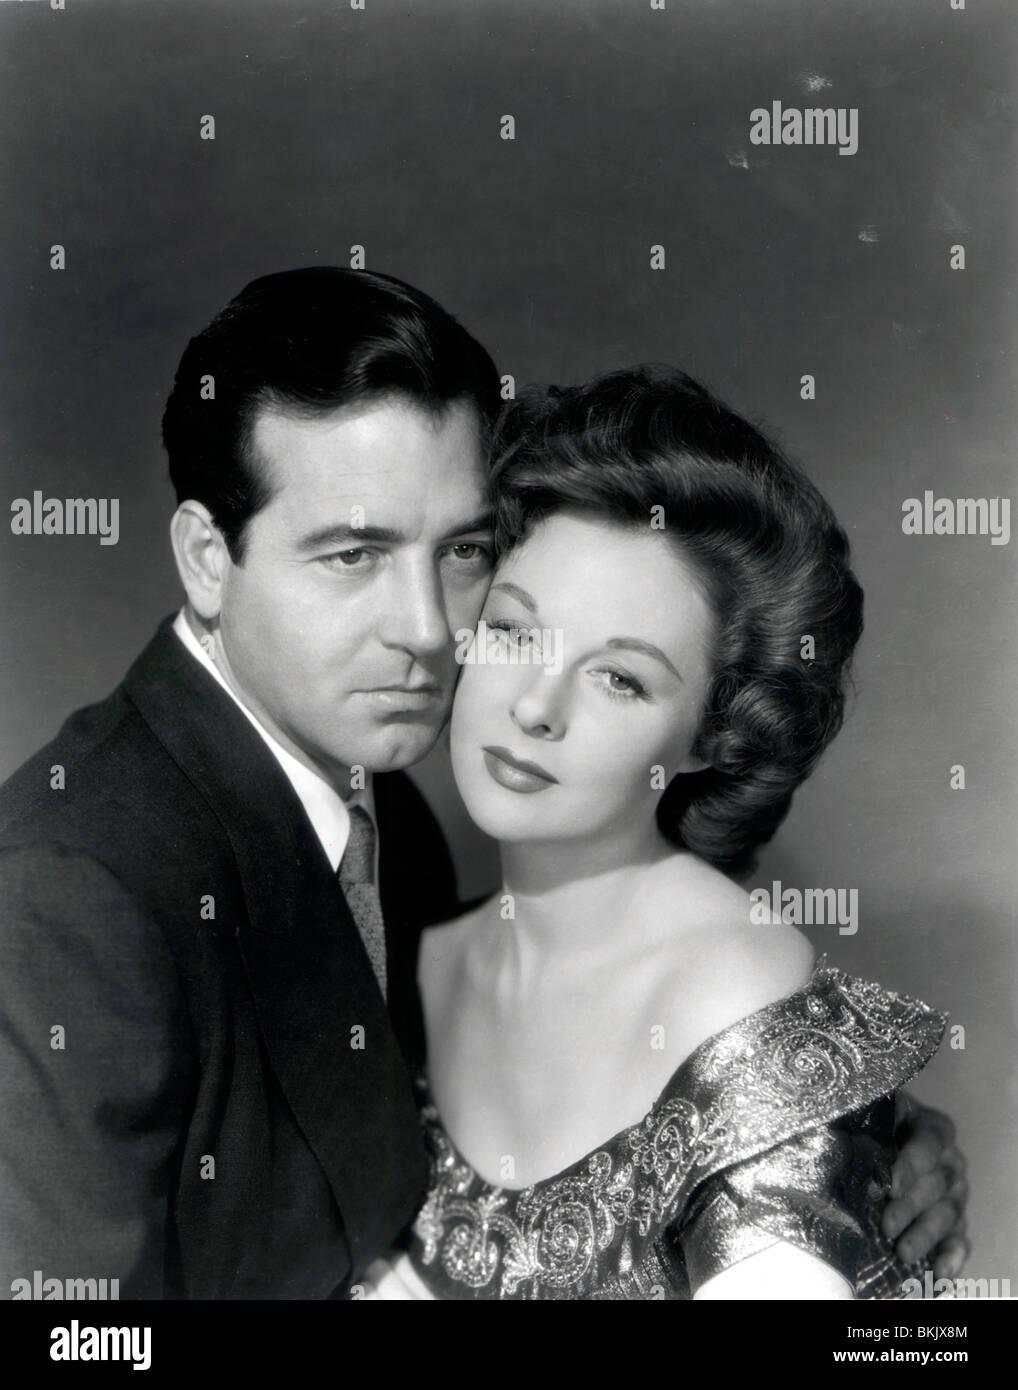 THE SAXON CHARM (1948) JOHN PAYNE, SUSAN HAYWARD SXCH 002 P - Stock Image